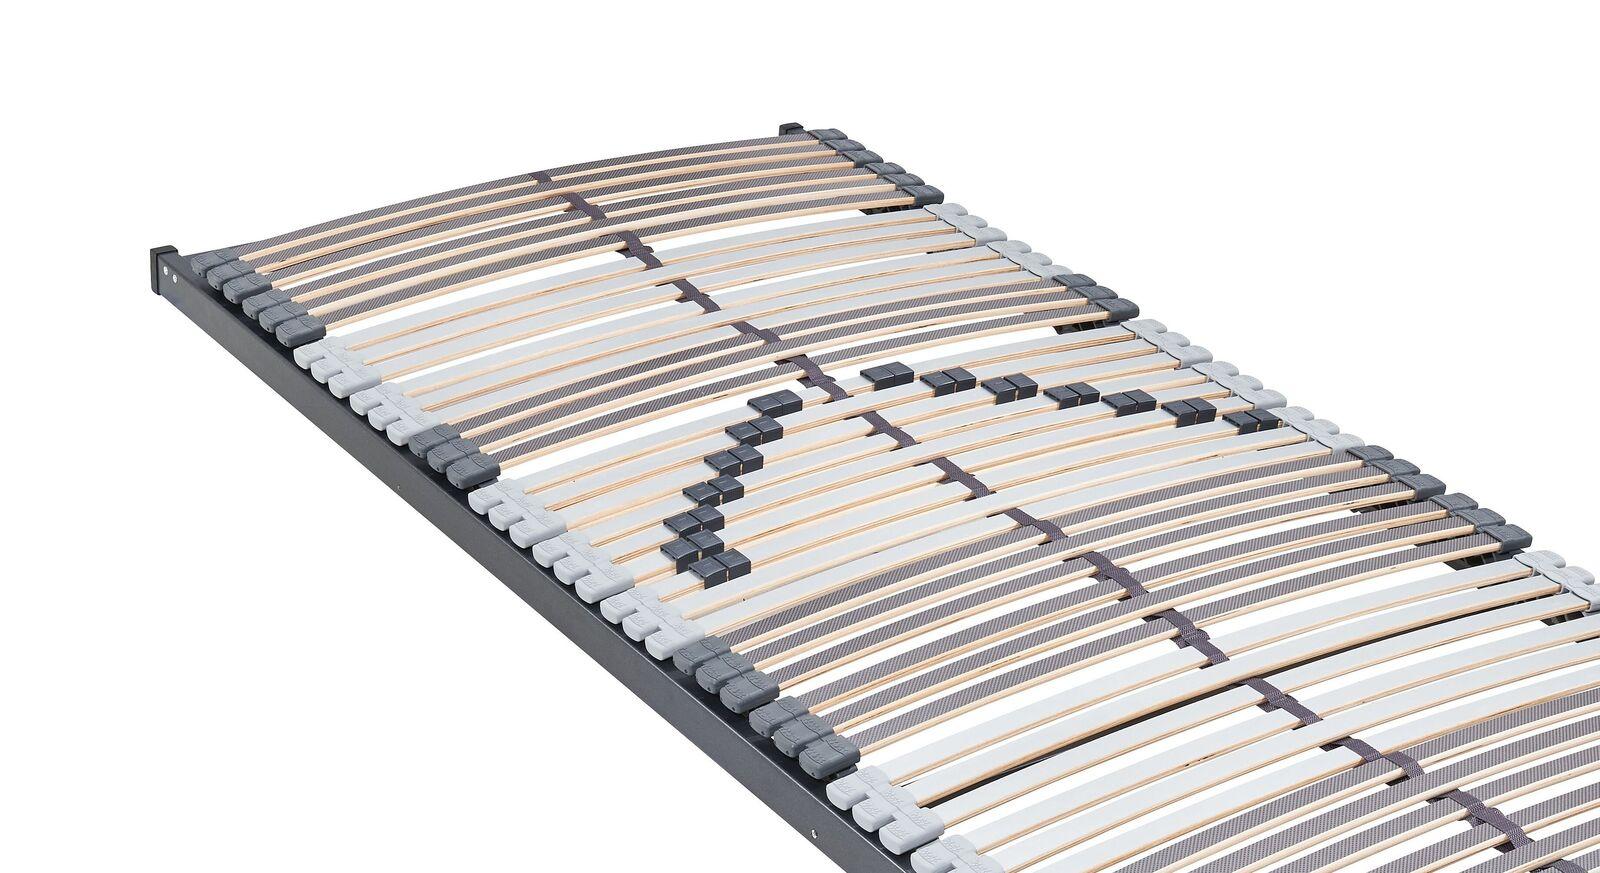 MUSTERRING Lattenrost Orthomatic FHR 60 mit 7-Zonen